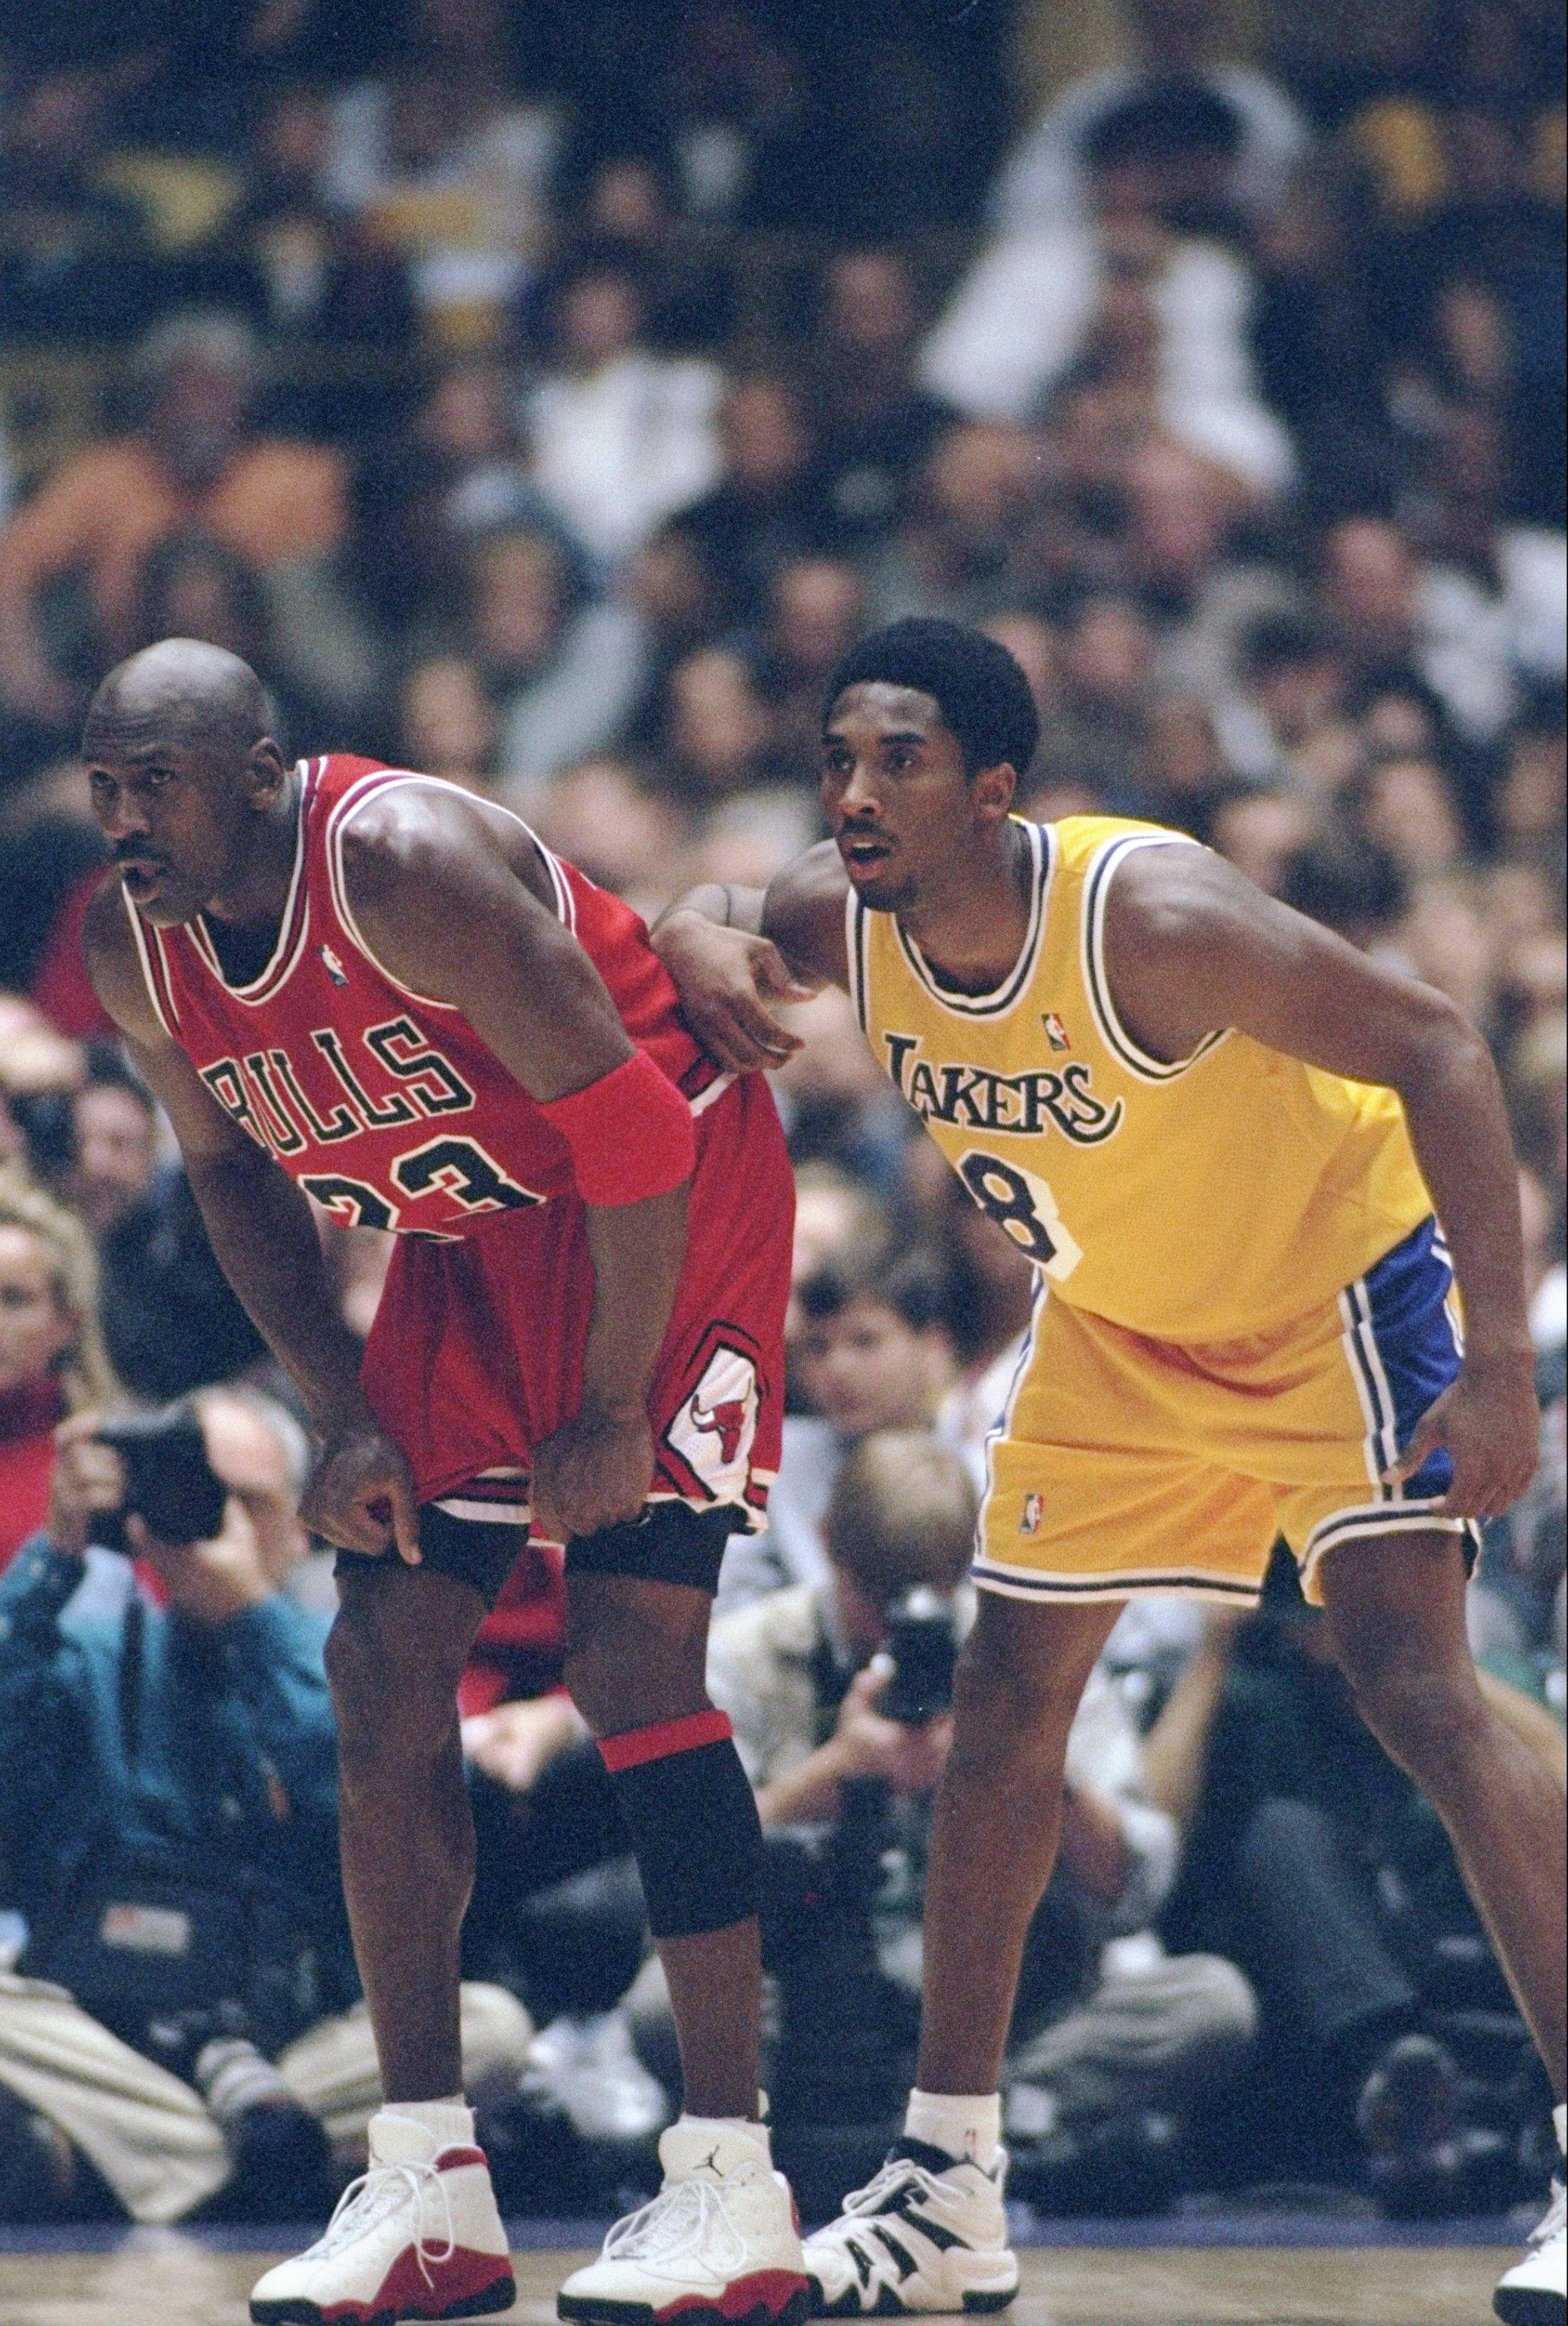 c71a50e041 Kobe Bryant: Comparing His Accolades to Michael Jordan's   Bleacher ...